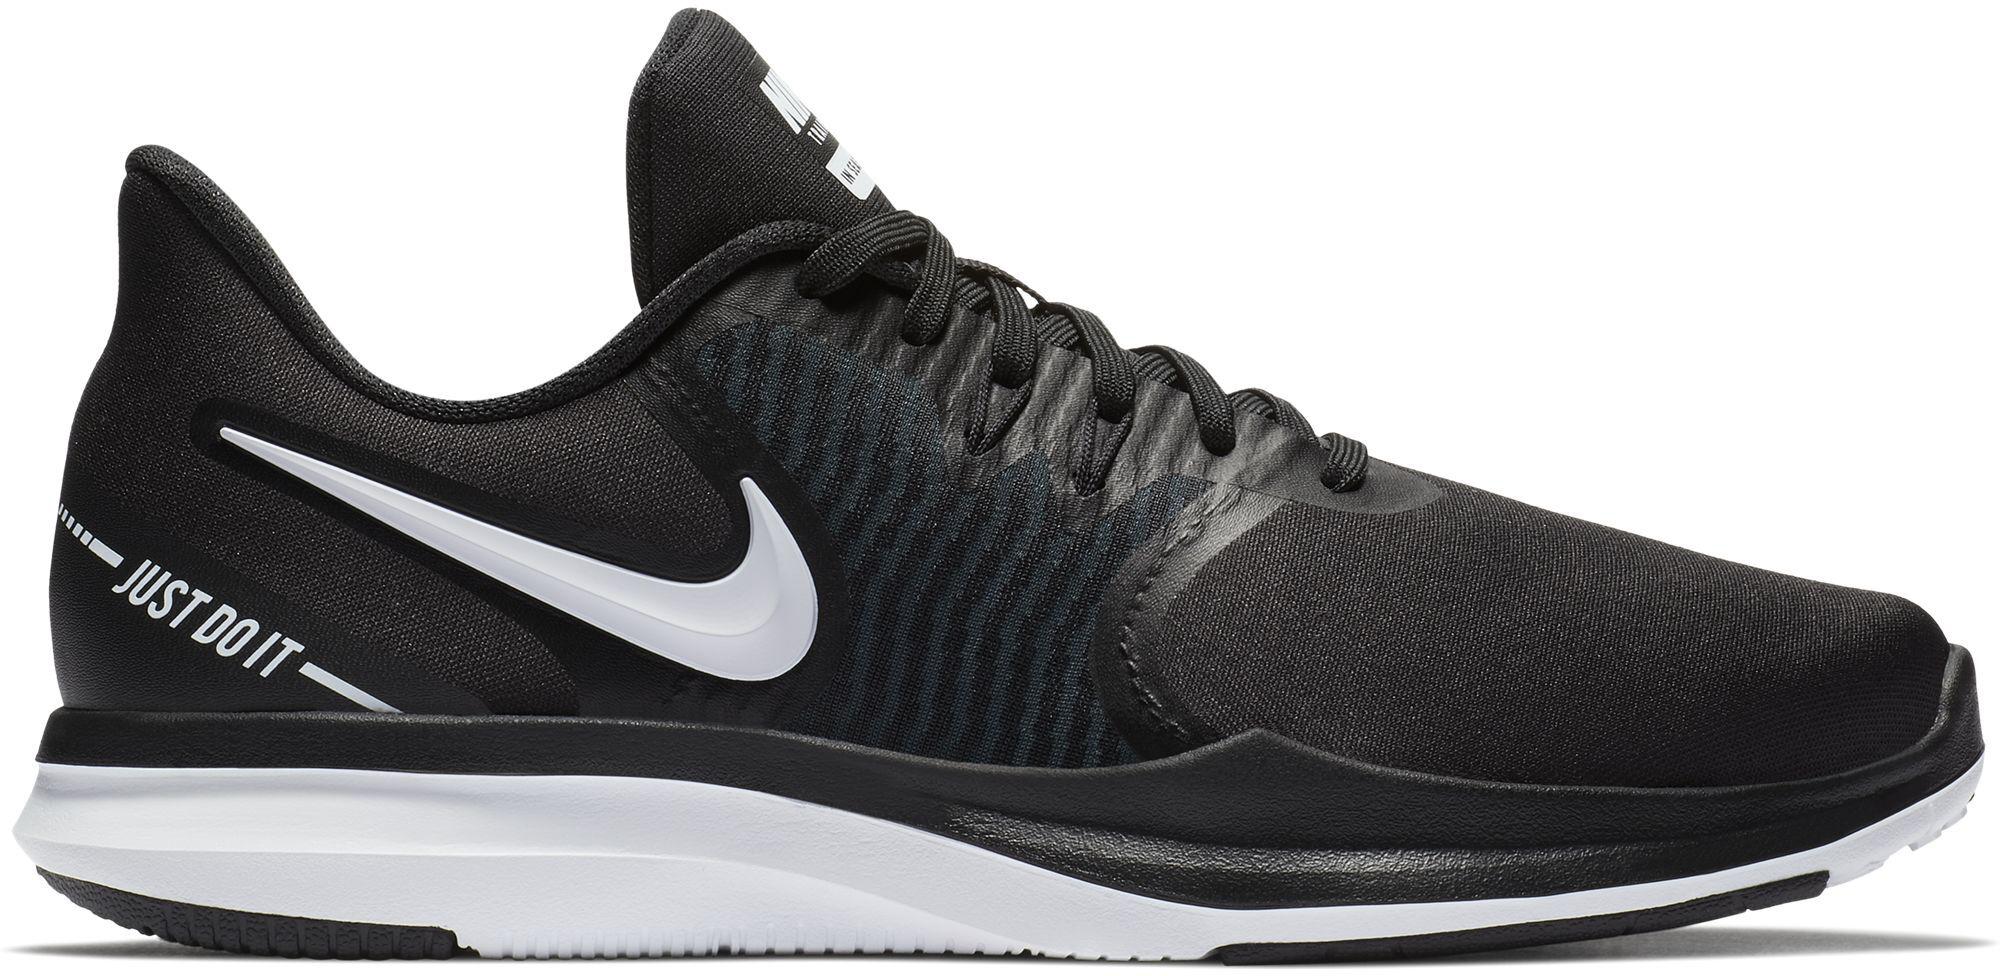 Nike AIR BELLA Zapatillas fitness e indoor Mujer Deporte